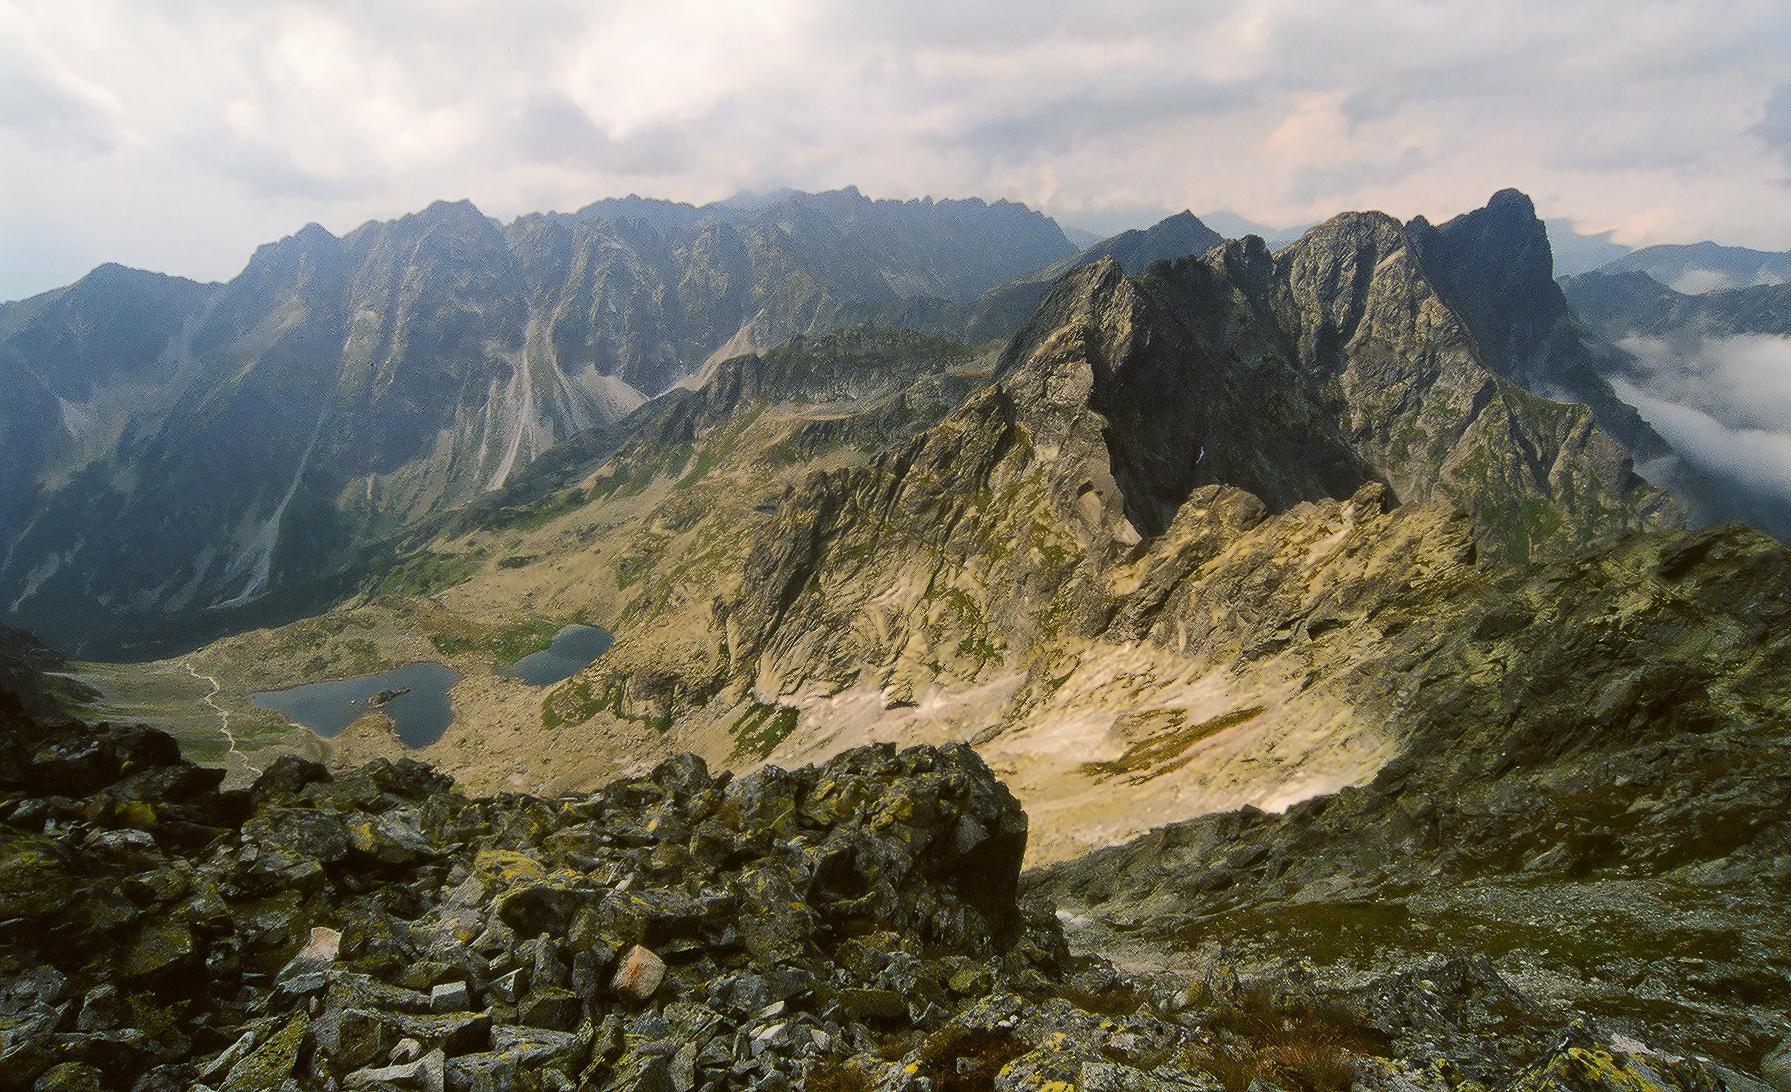 The view from Rysy towards Mengushovetska gran...